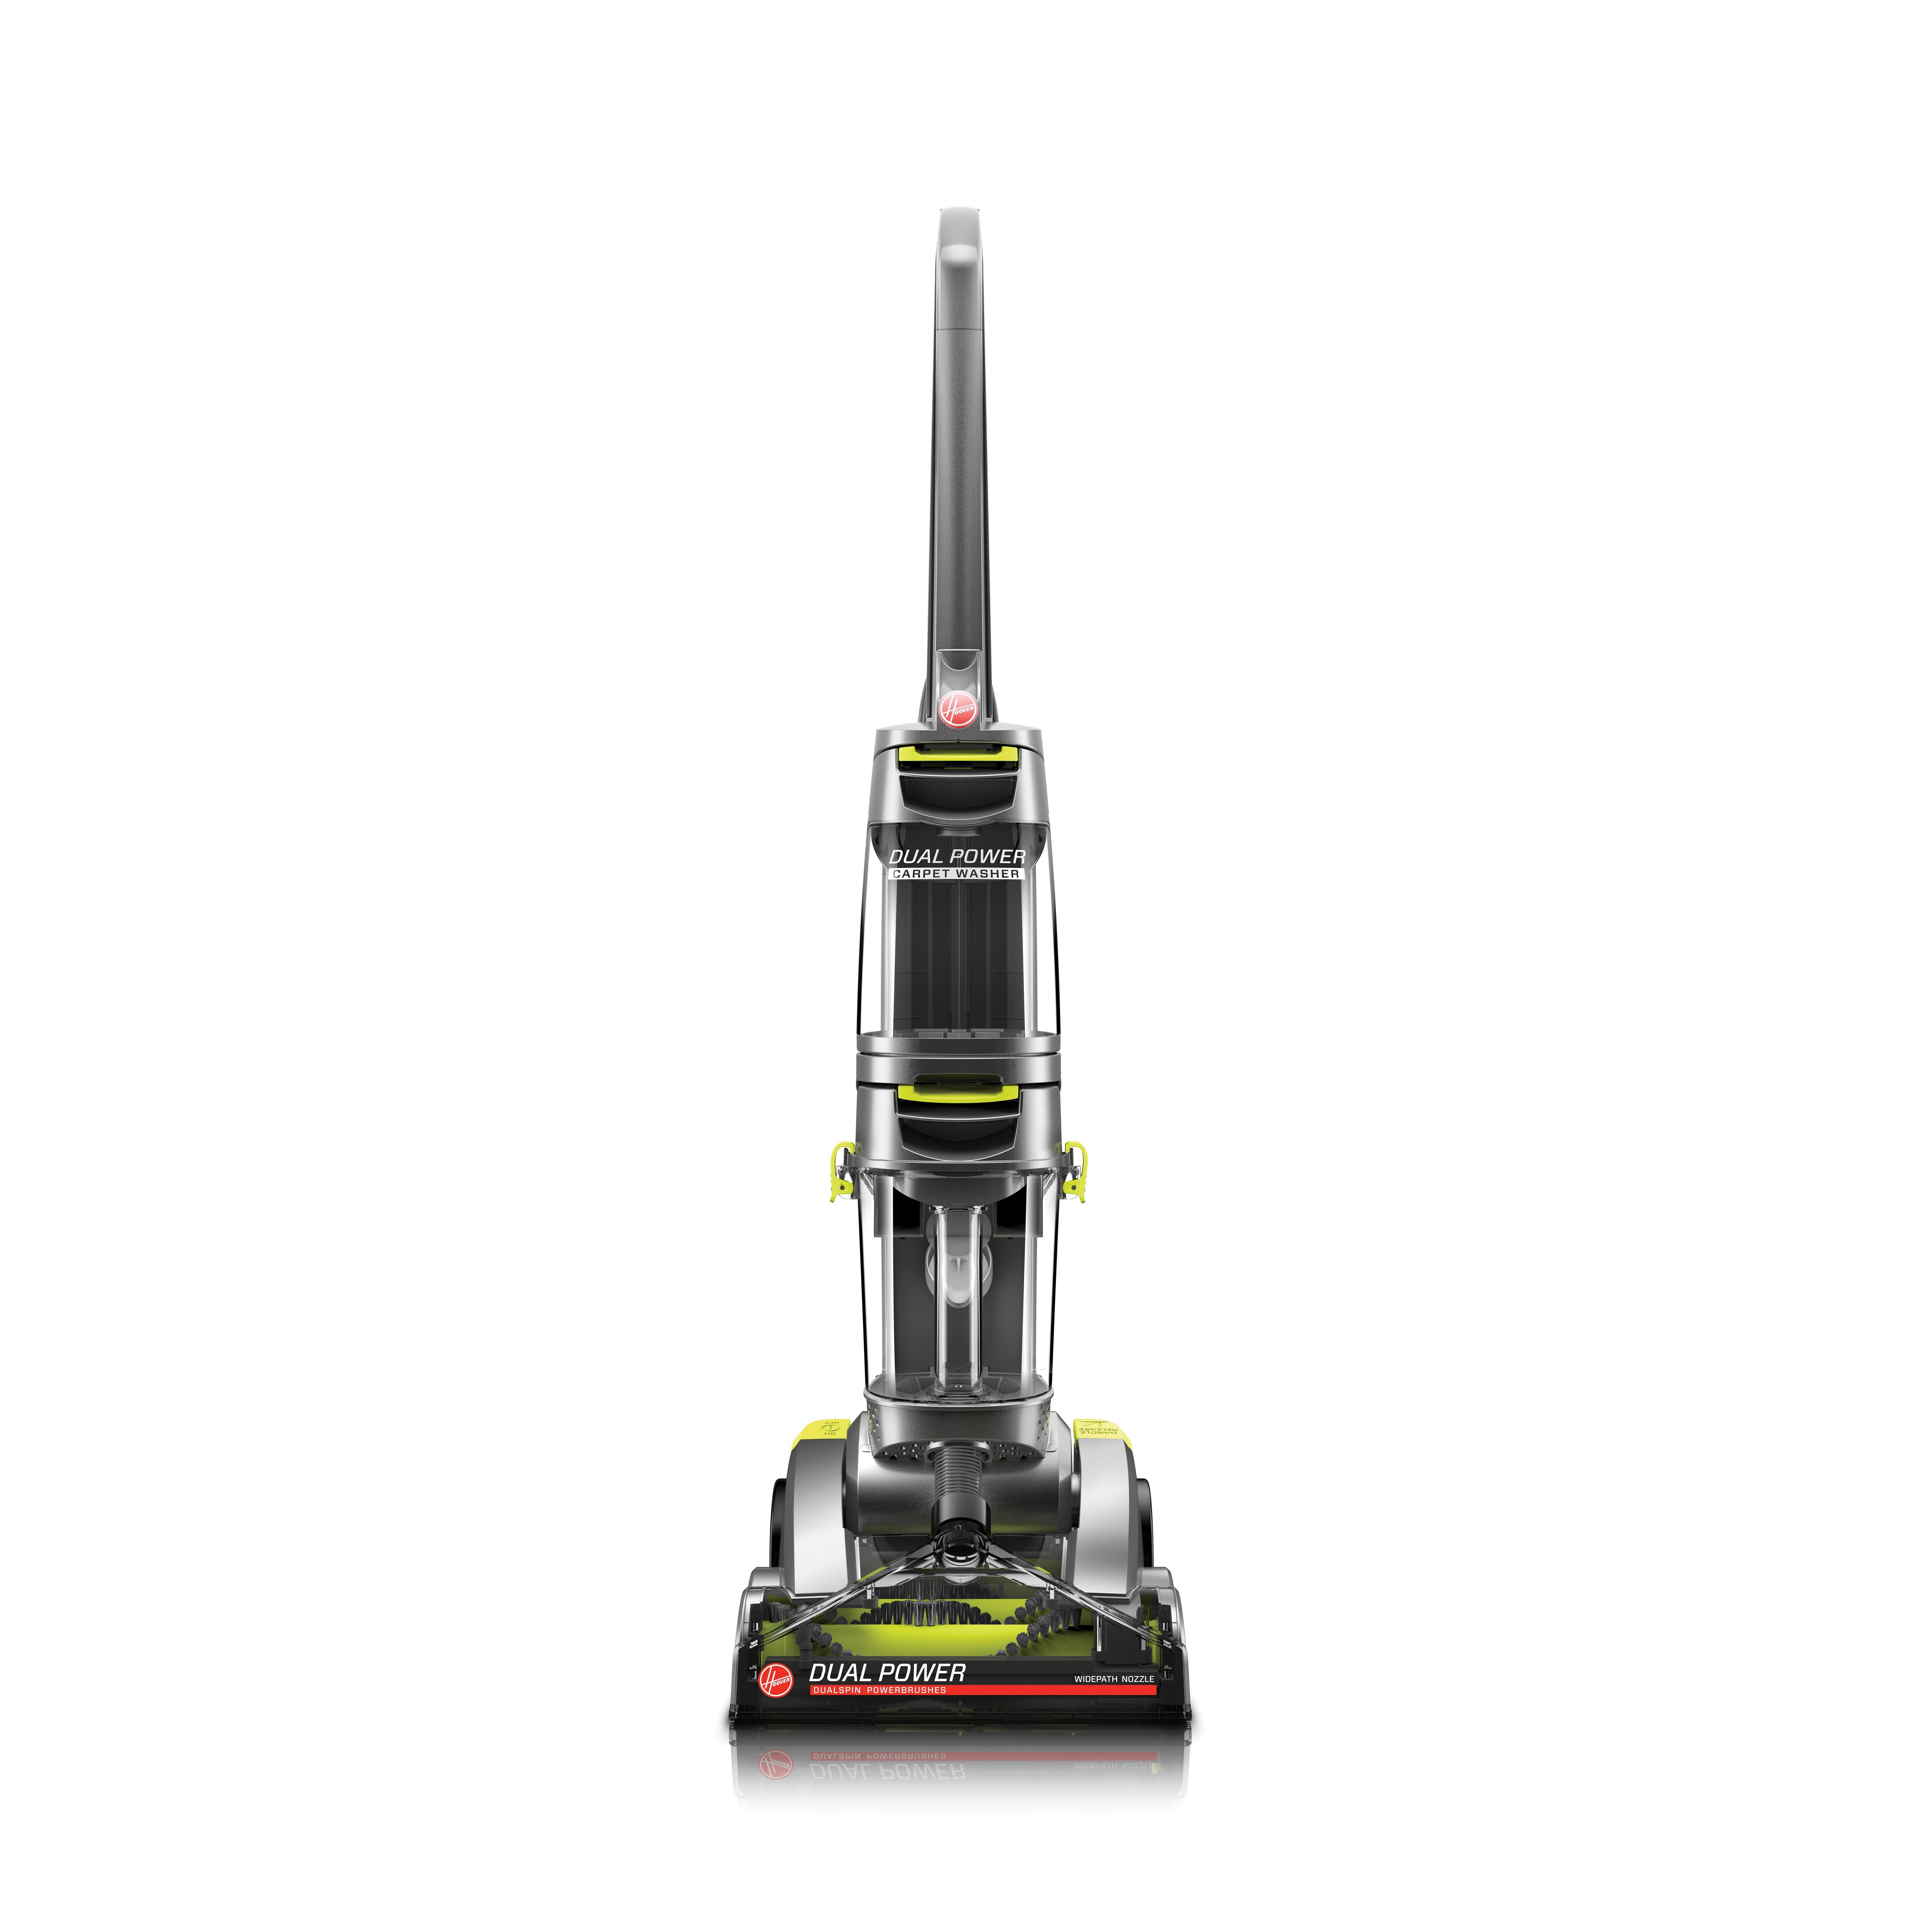 Dual Power Carpet Washer